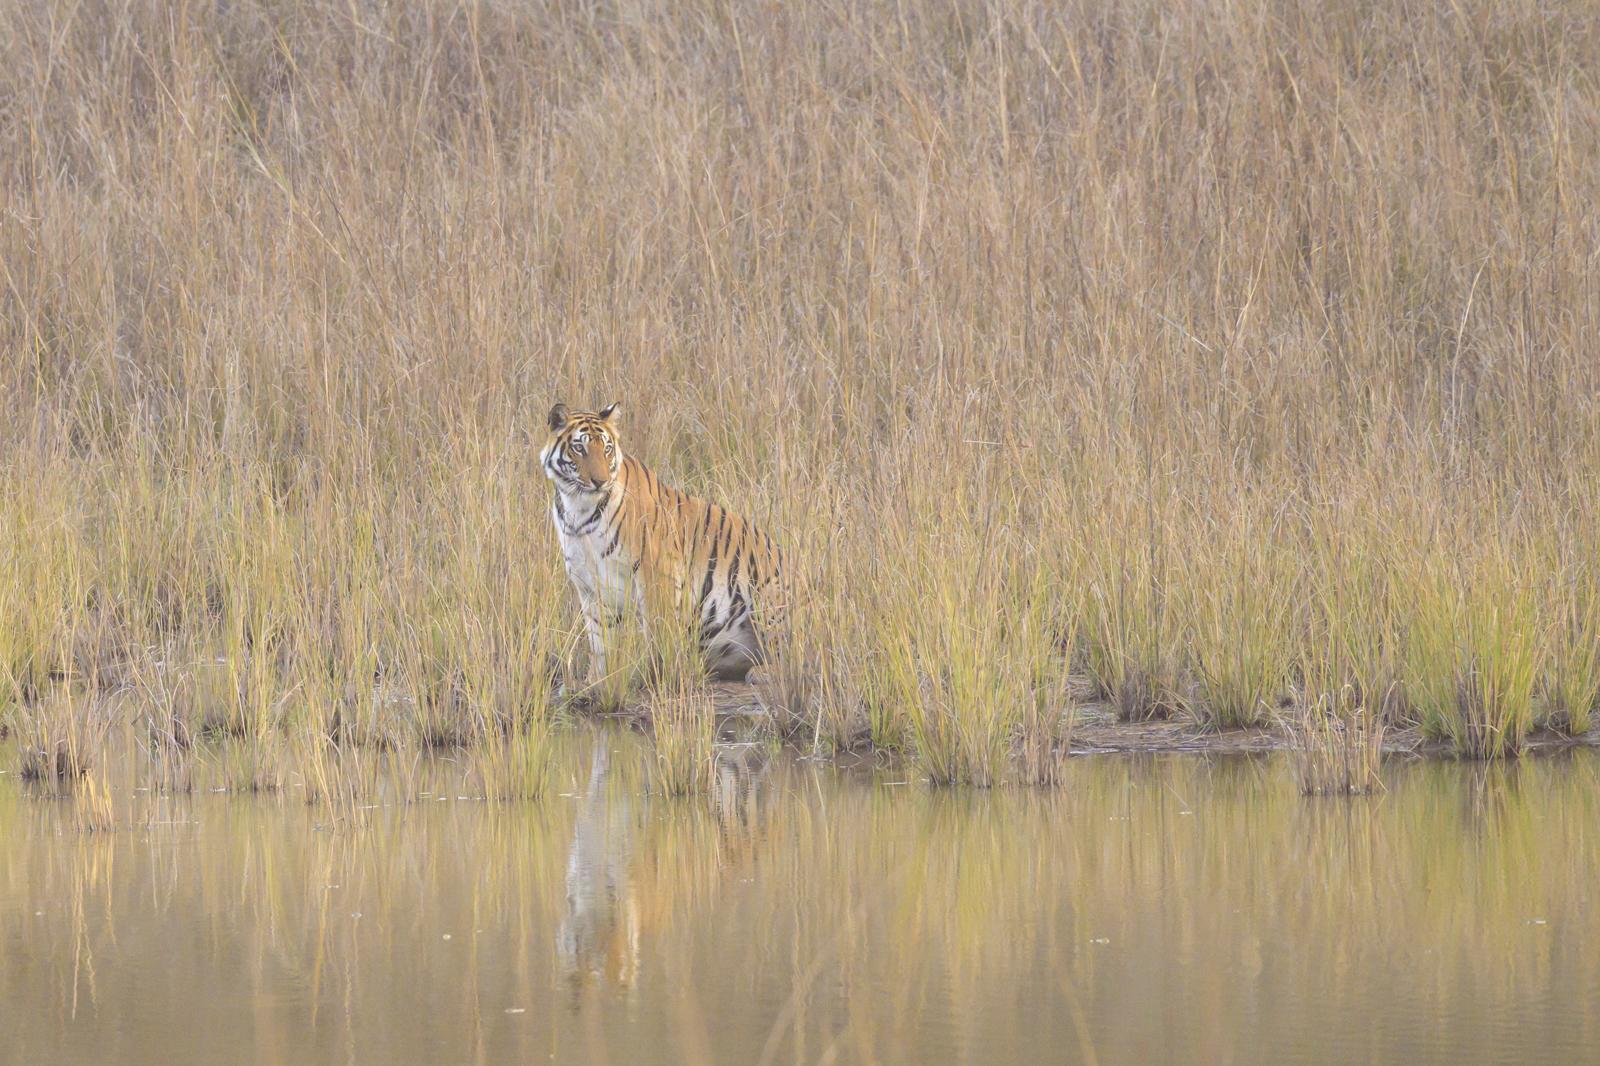 2-Wild tigers of india